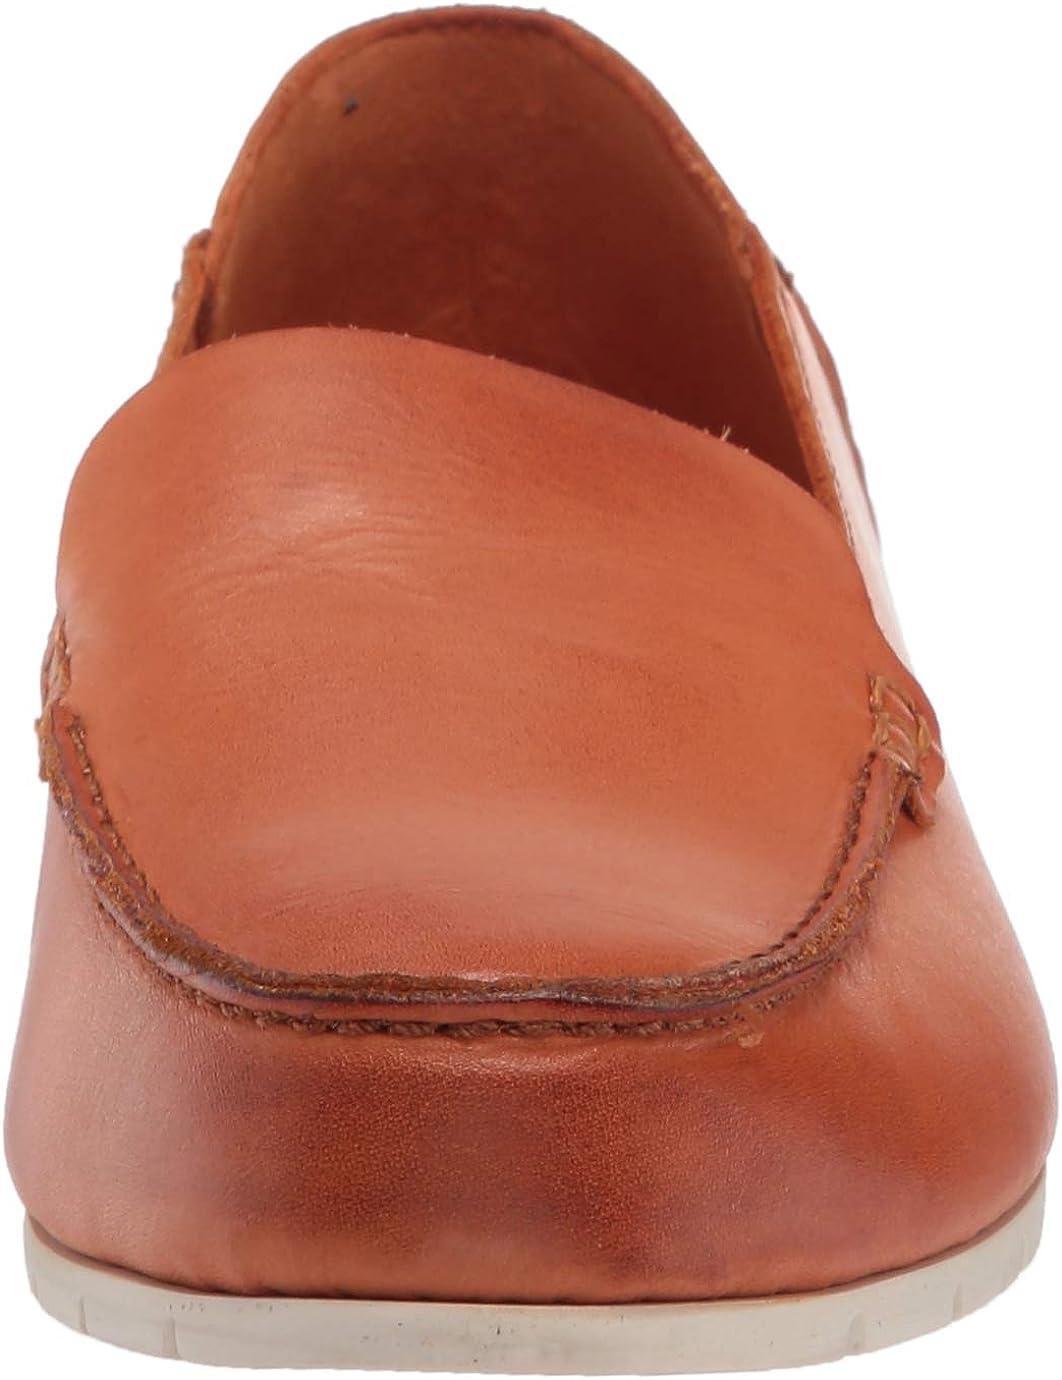 Frye Womens Sedona Venetian Moc Loafer Flat